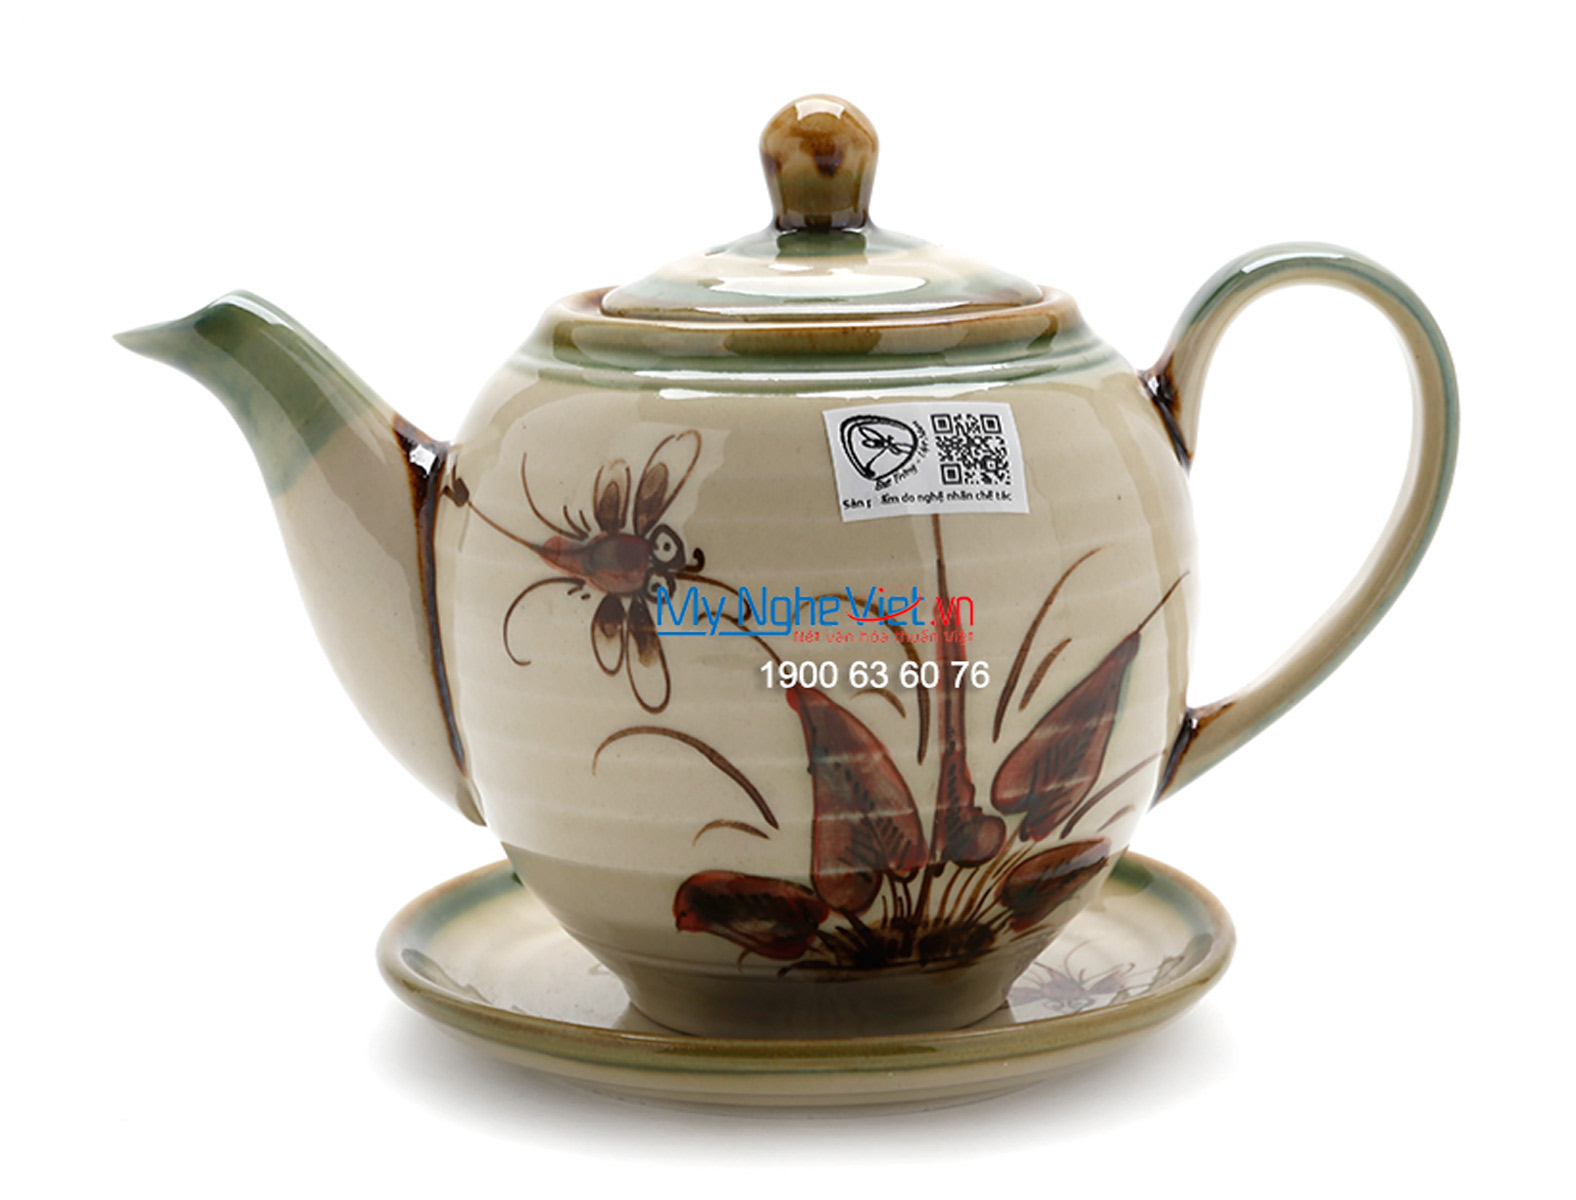 Bat Trang Tea set with Glossy Glaze, Dragonfly Pattern and Pottery Strap MNV-TS029-3